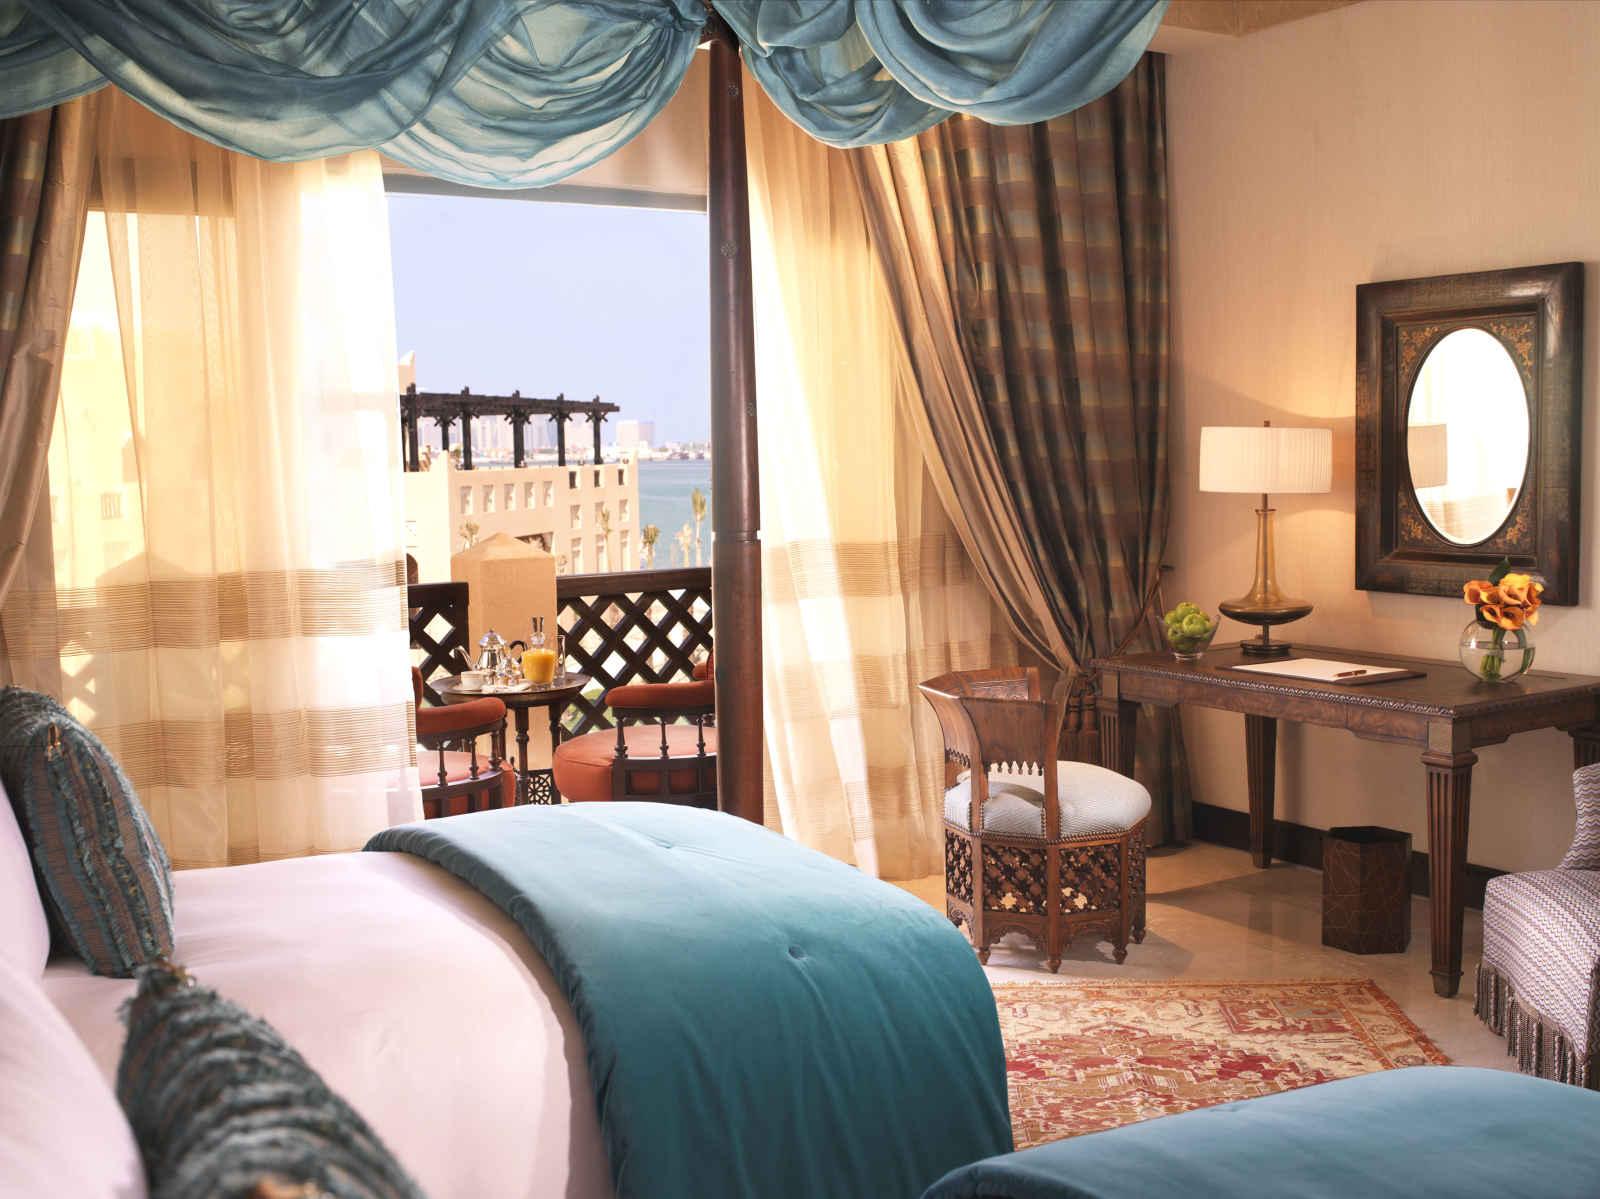 Qatar : Sharq Village & Spa, A Ritz-Carlton Hotel